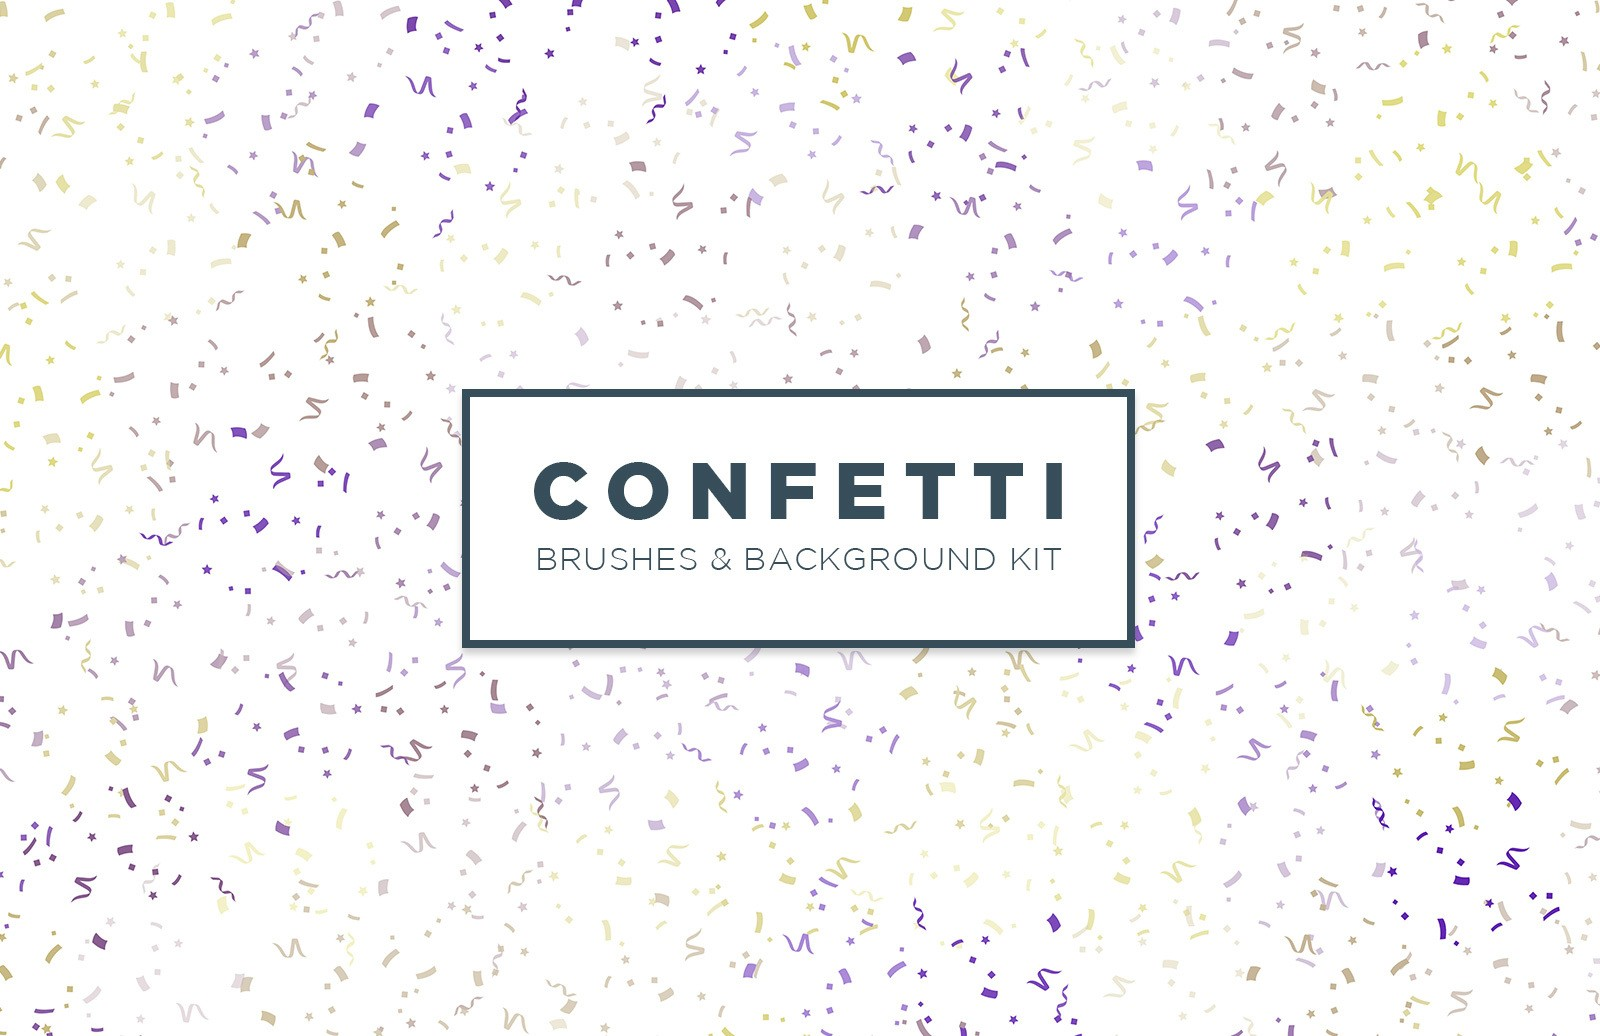 Confetti - Free Brushes and Background Kit